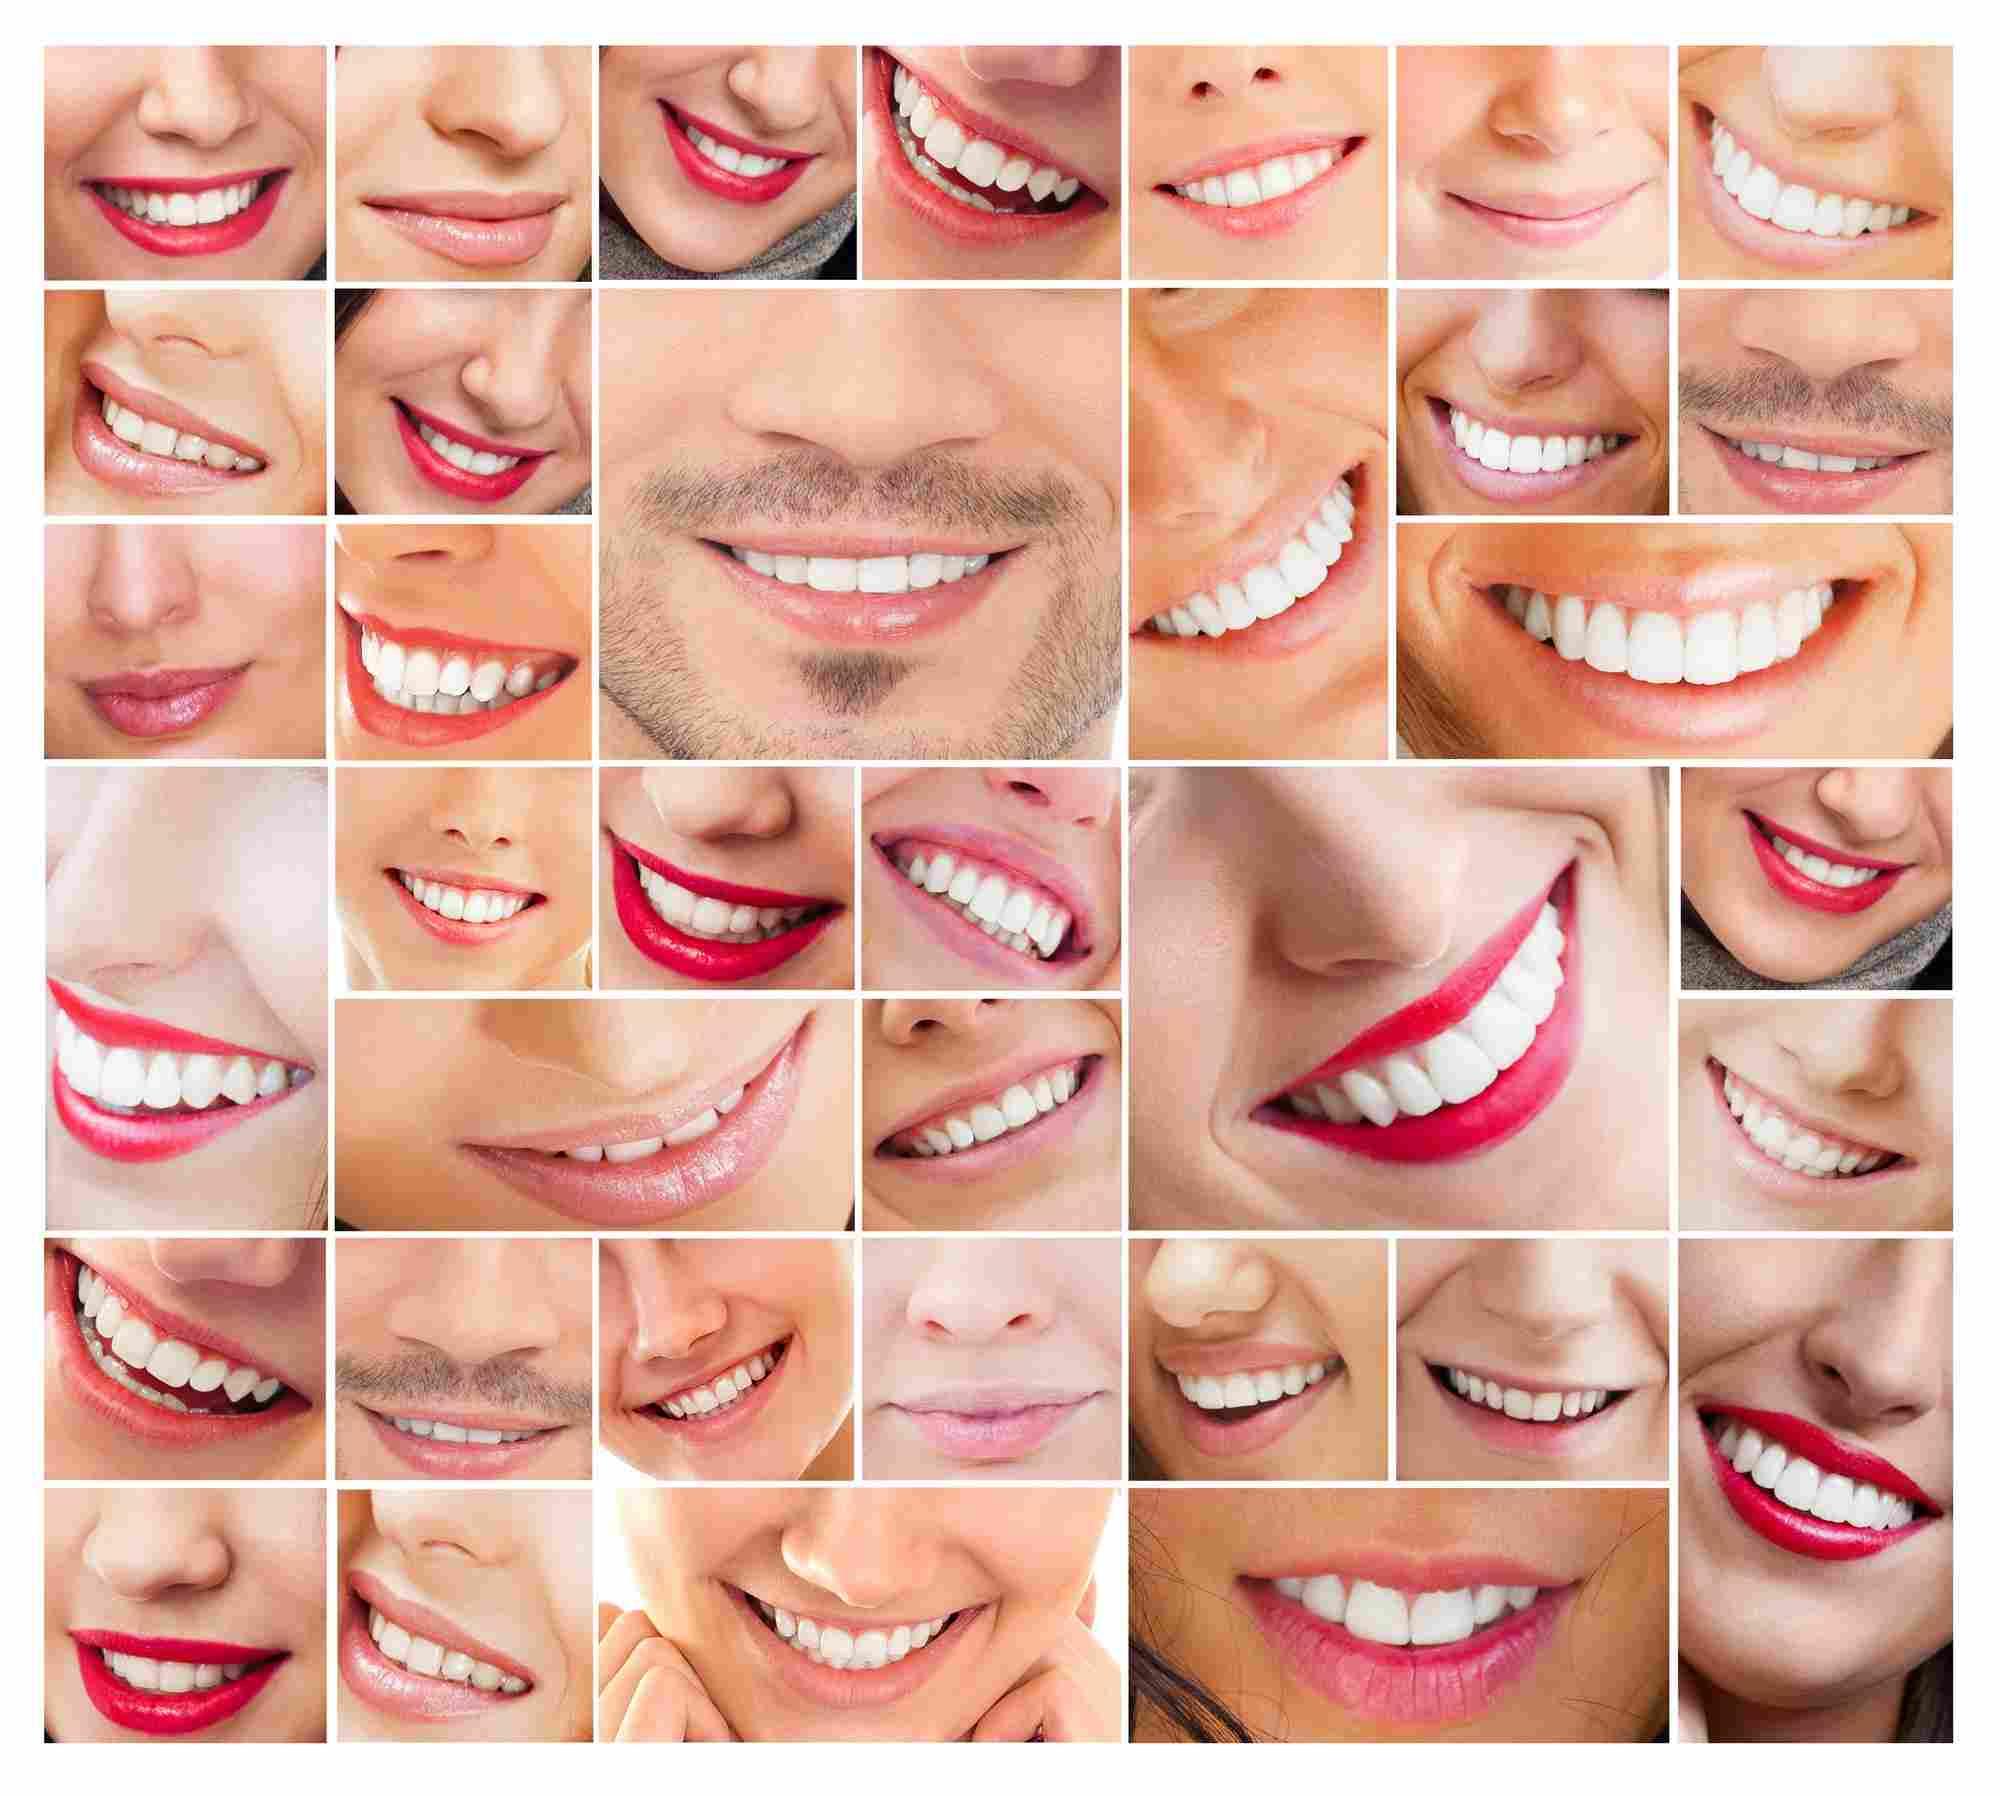 https://www.dentistasecija.es/wp-content/uploads/2015/09/shutterstock_101245336-2.jpg